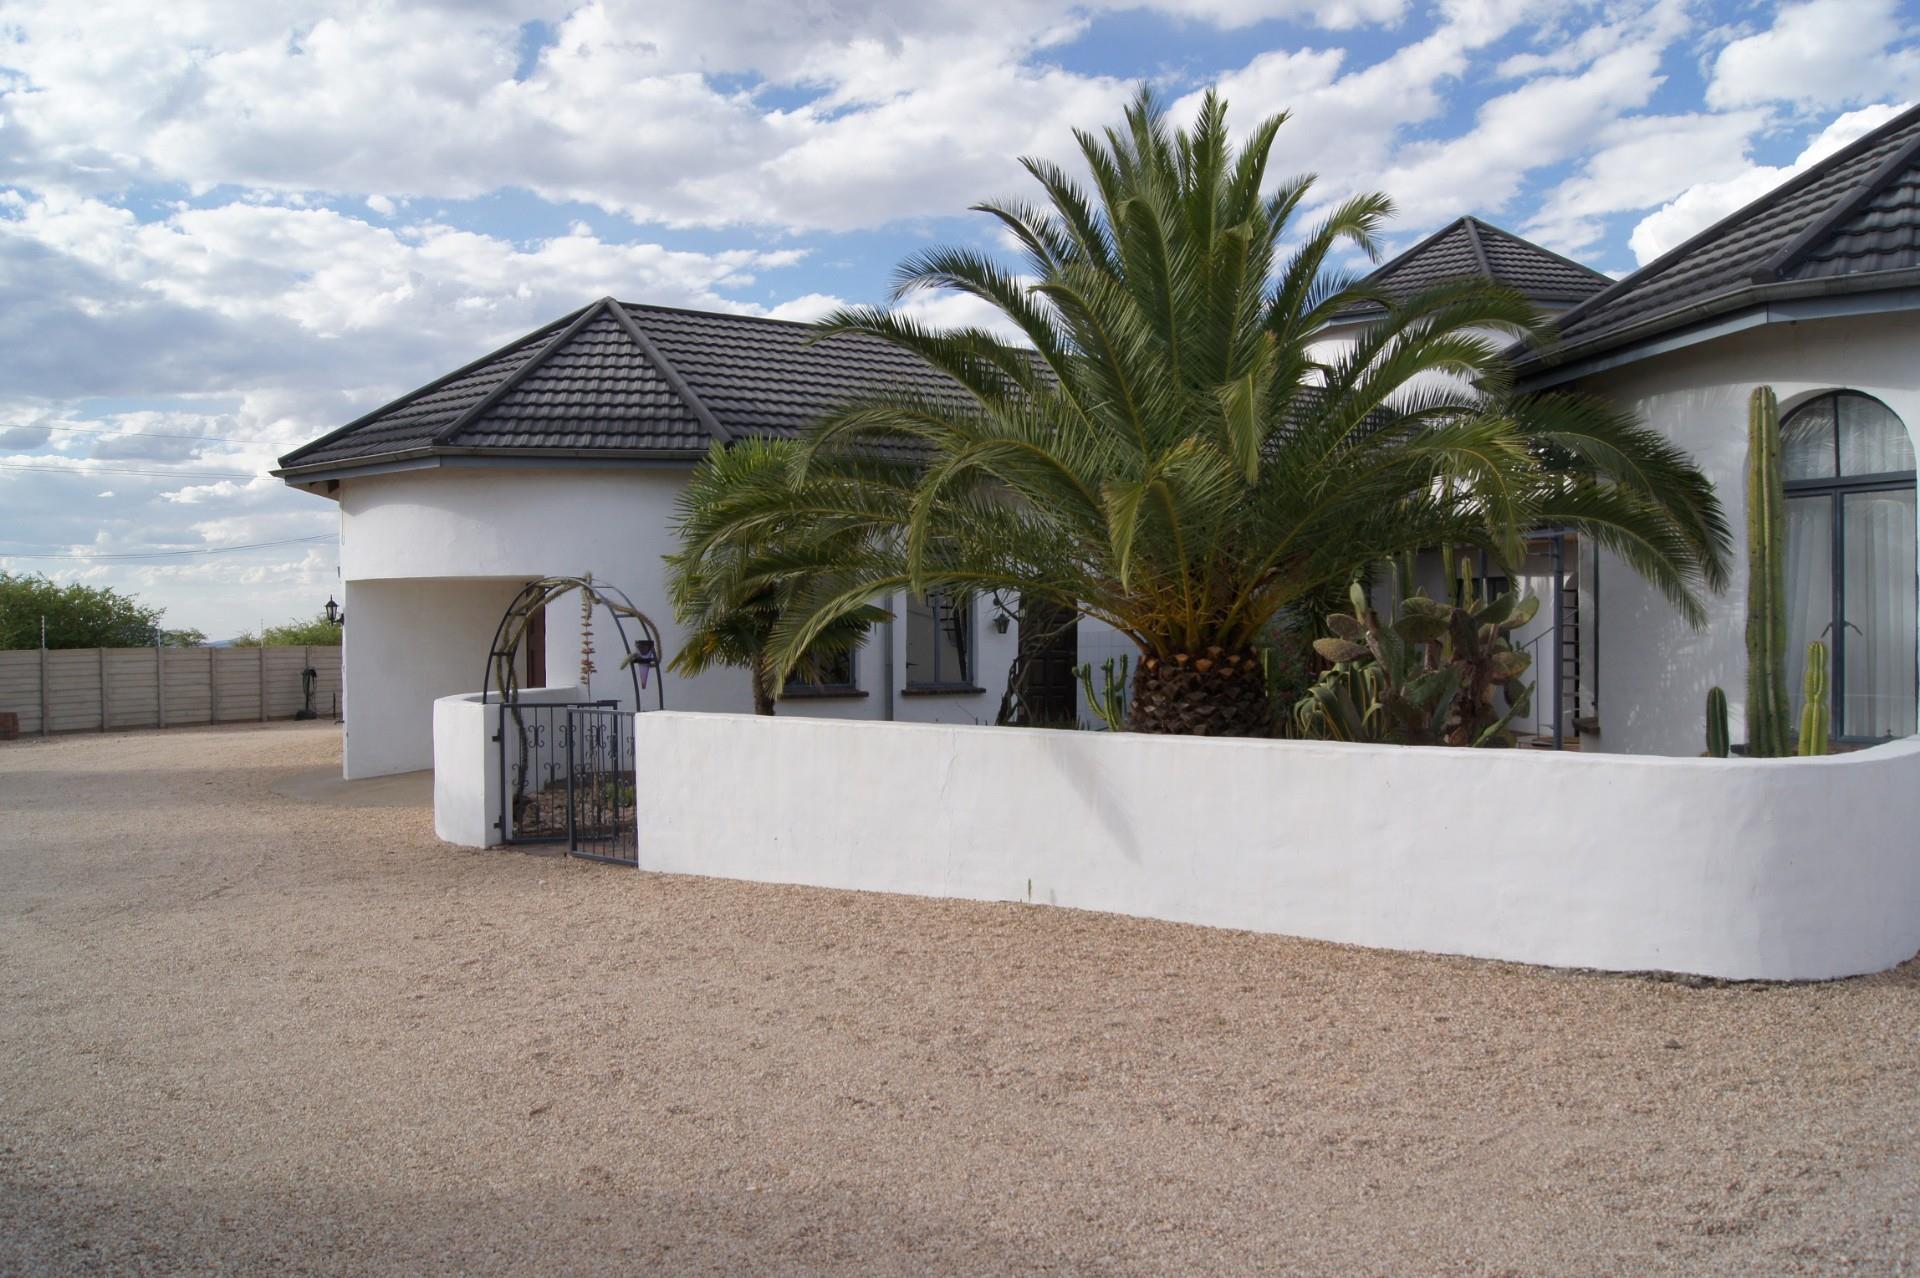 10 Bedroom House For Sale in Brakwater